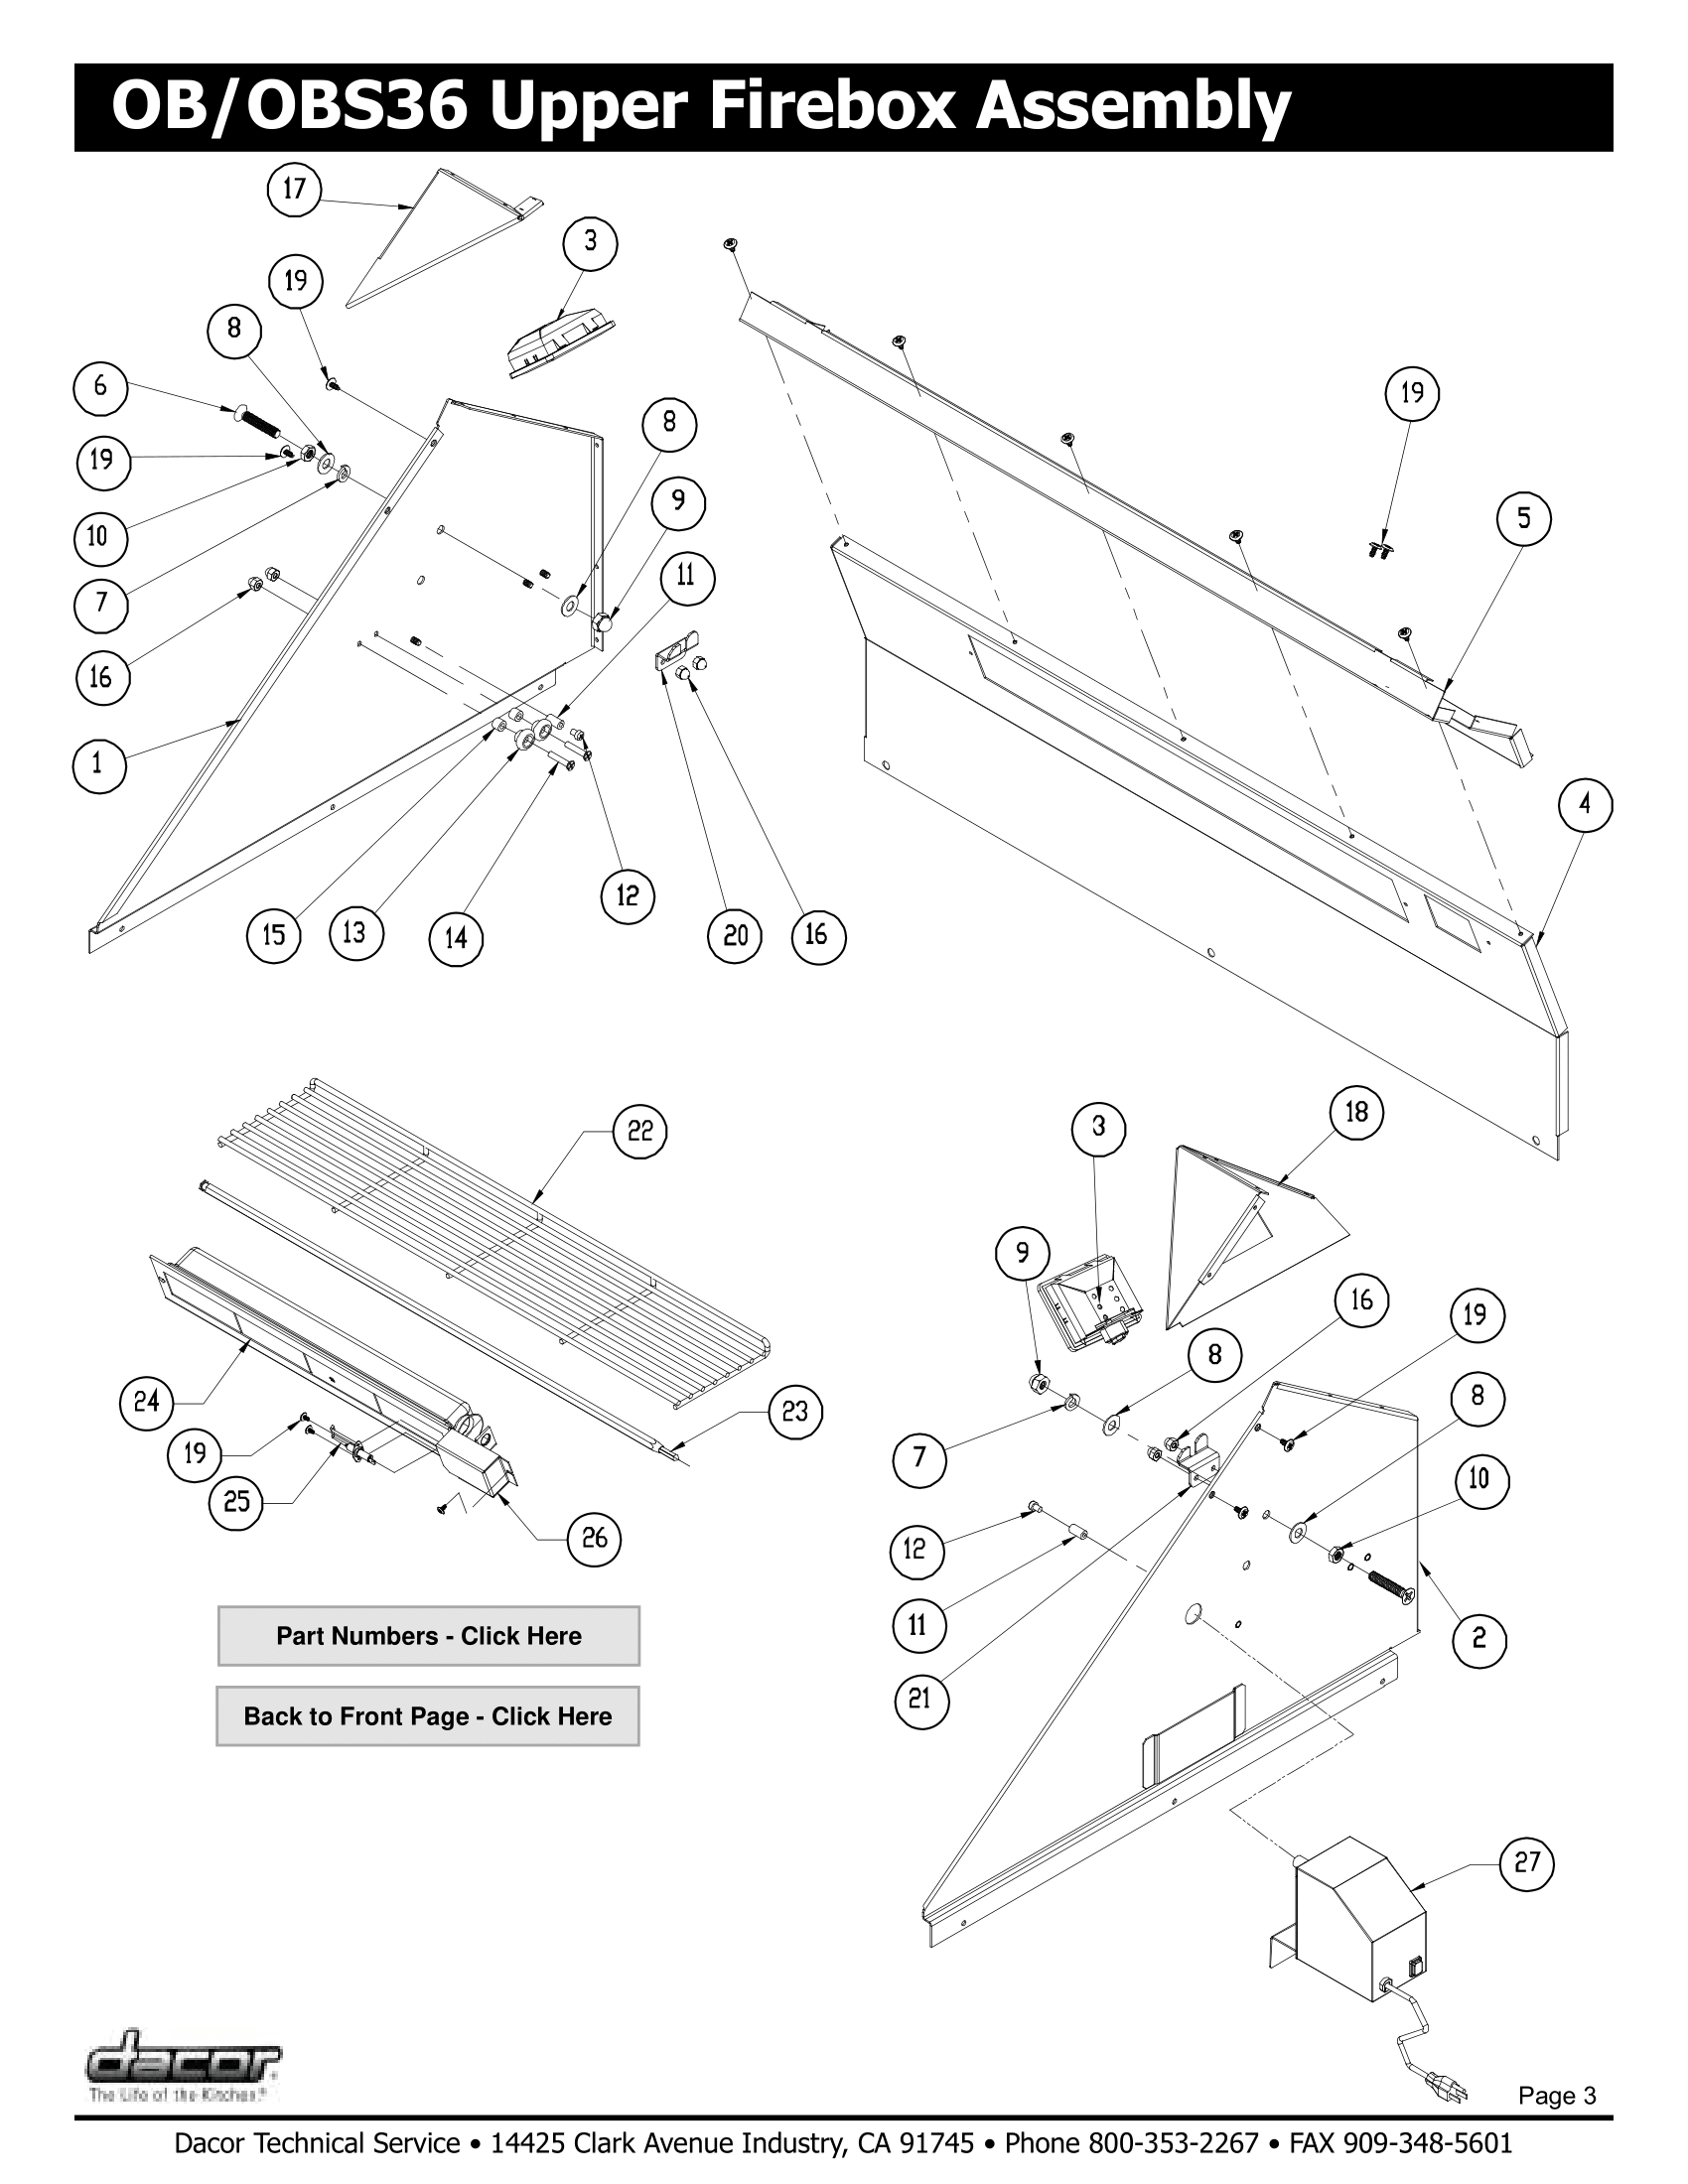 Dacor OBS36 Upper Firebox Assembly Schematic